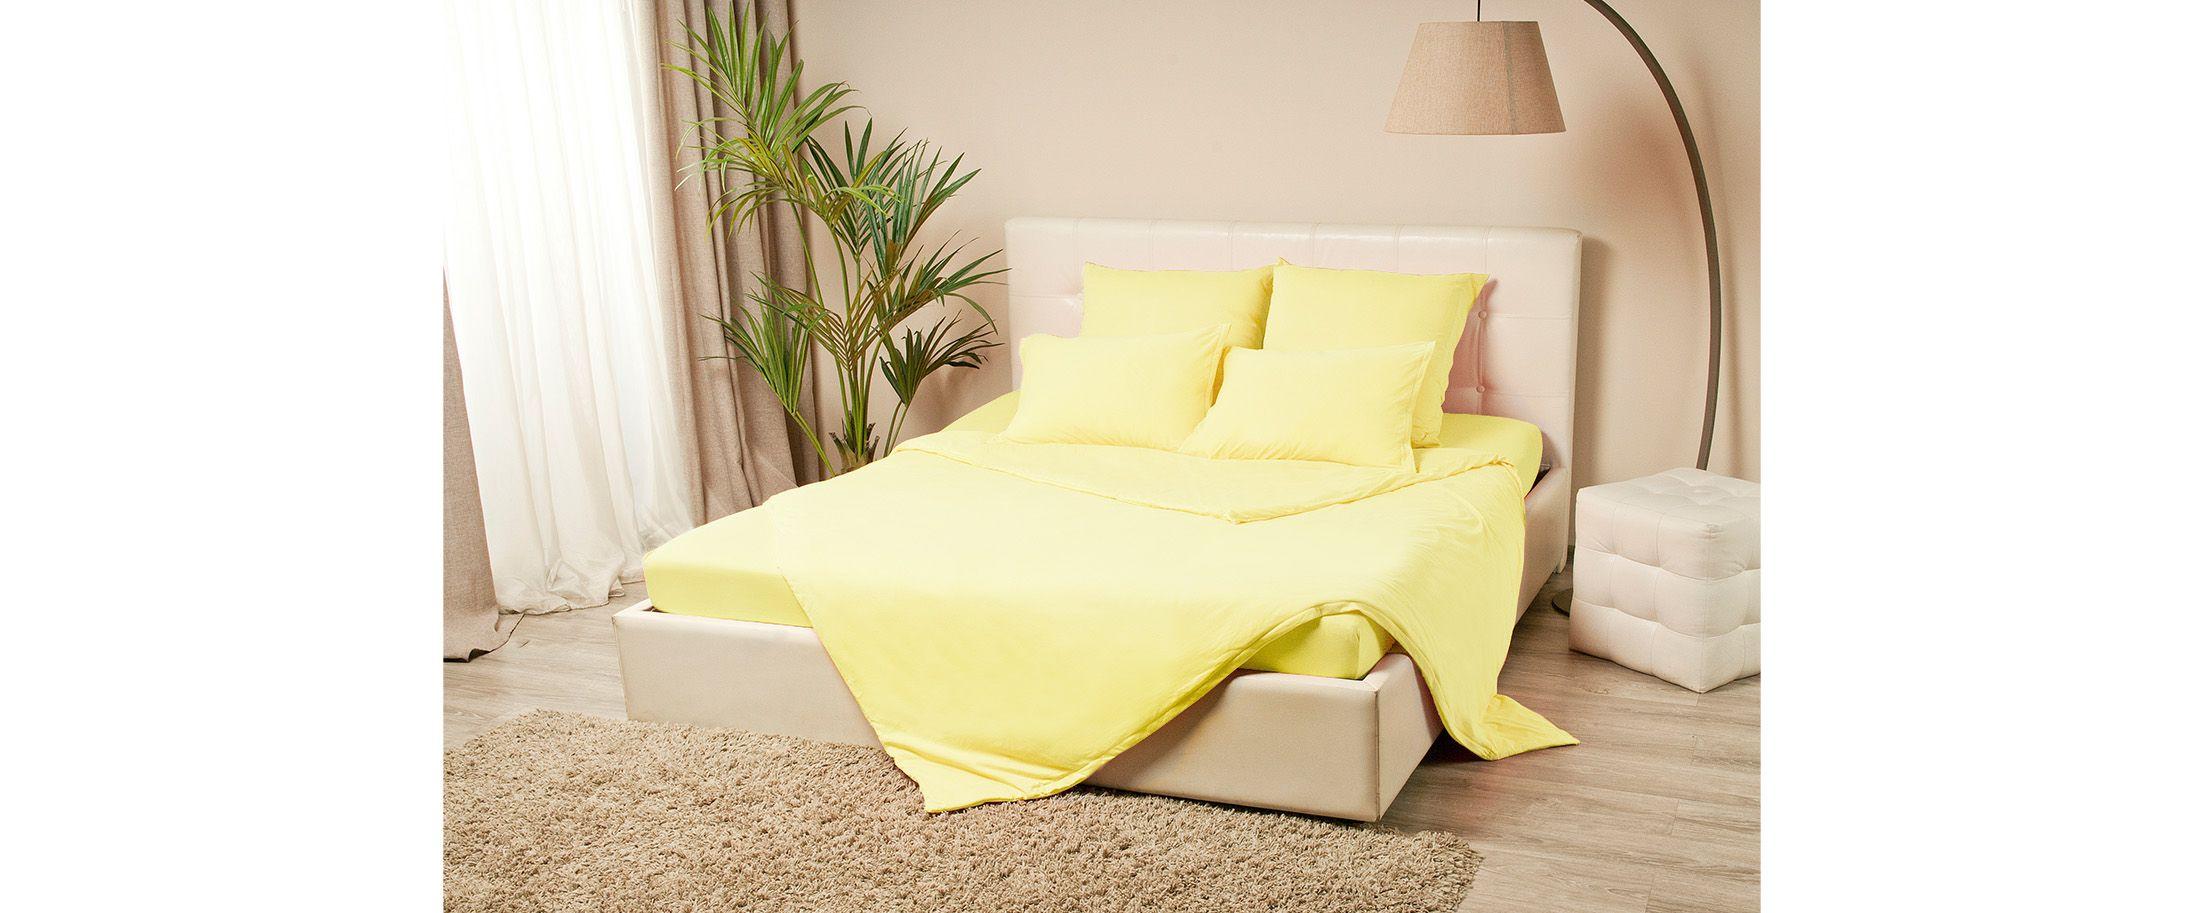 Простыня трикотажная на резинке 180х200 желтого цвета Violett Модель 4000Простыня трикотажная на резинке 180х200 Violett Модель 4000. Артикул К000596<br>